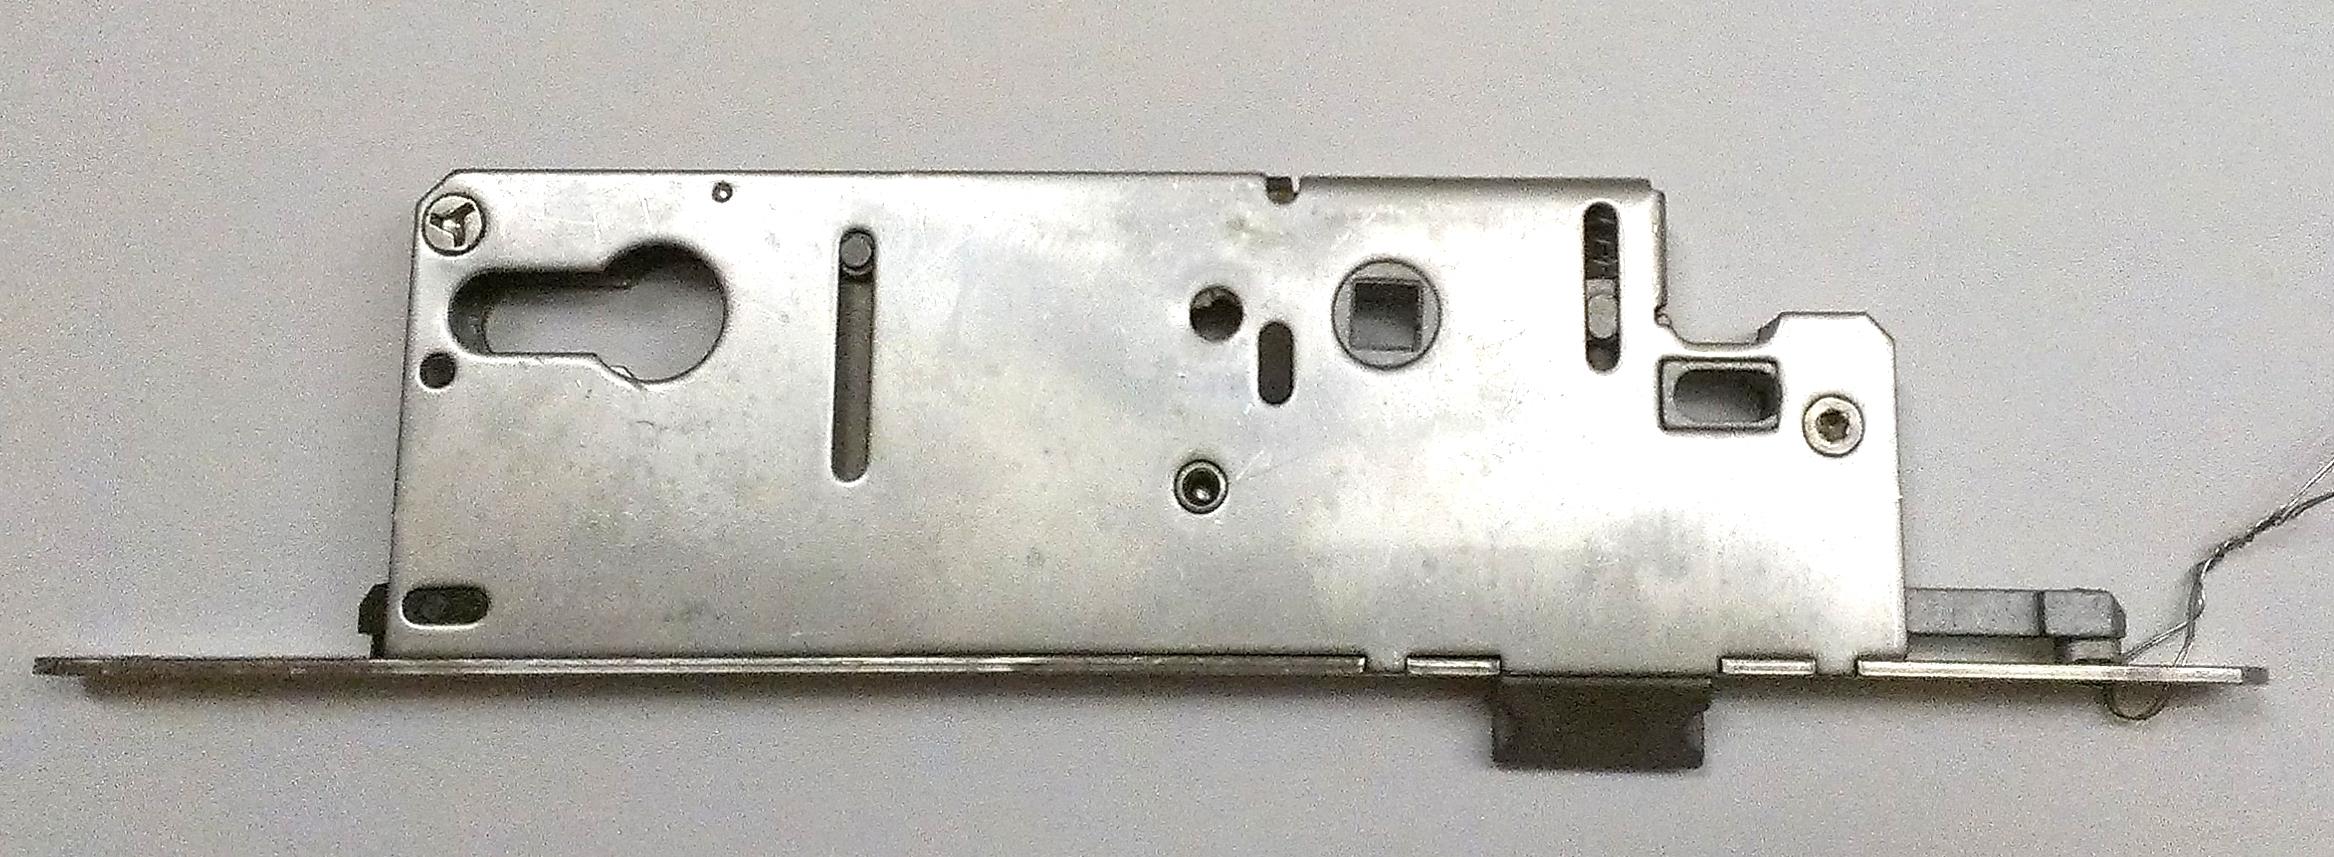 Hoppe Singlepoint Mortise Lock 45mm Backset And 25 4mm